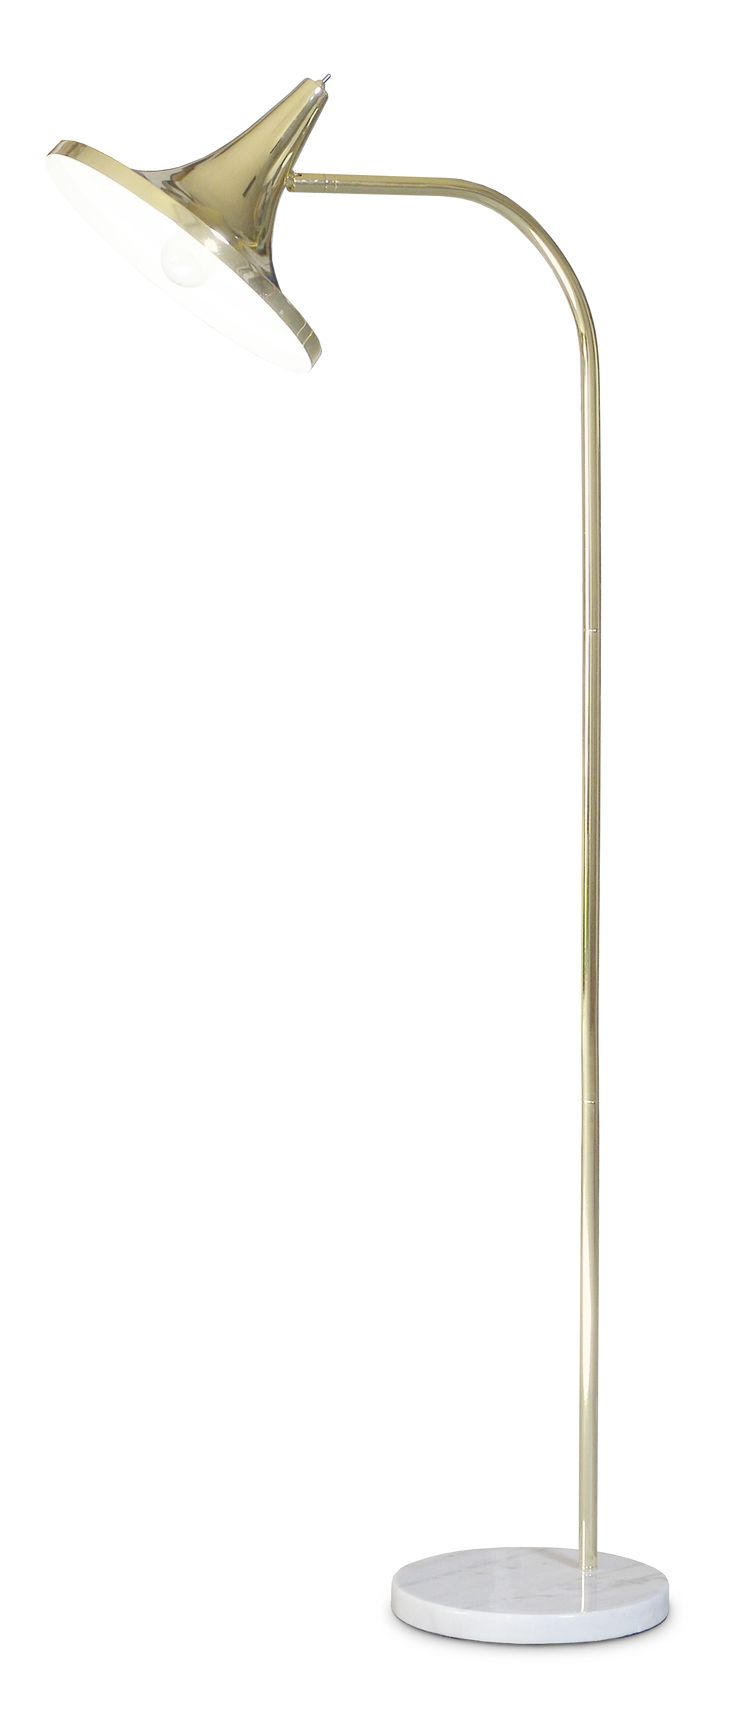 Brass overarching design floor lamp Lakki is made of marble, chrome and metal designed by Laura Väre. Shade resambles a hat. #finnishdesign #lighting #Nature #Scandinavian #Nordic #Living room #Bedroom